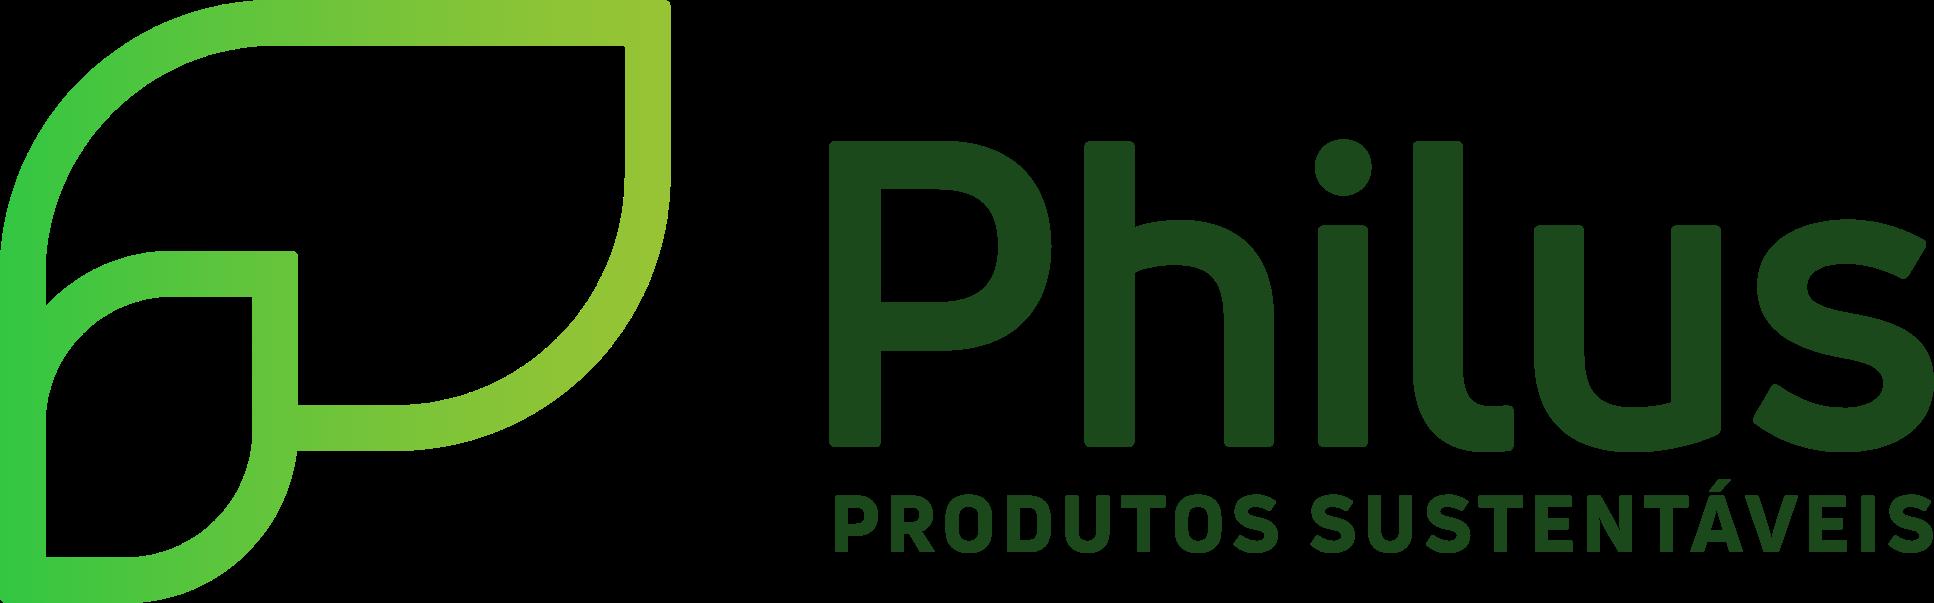 https://philusprodutossustentaveis.com.br/